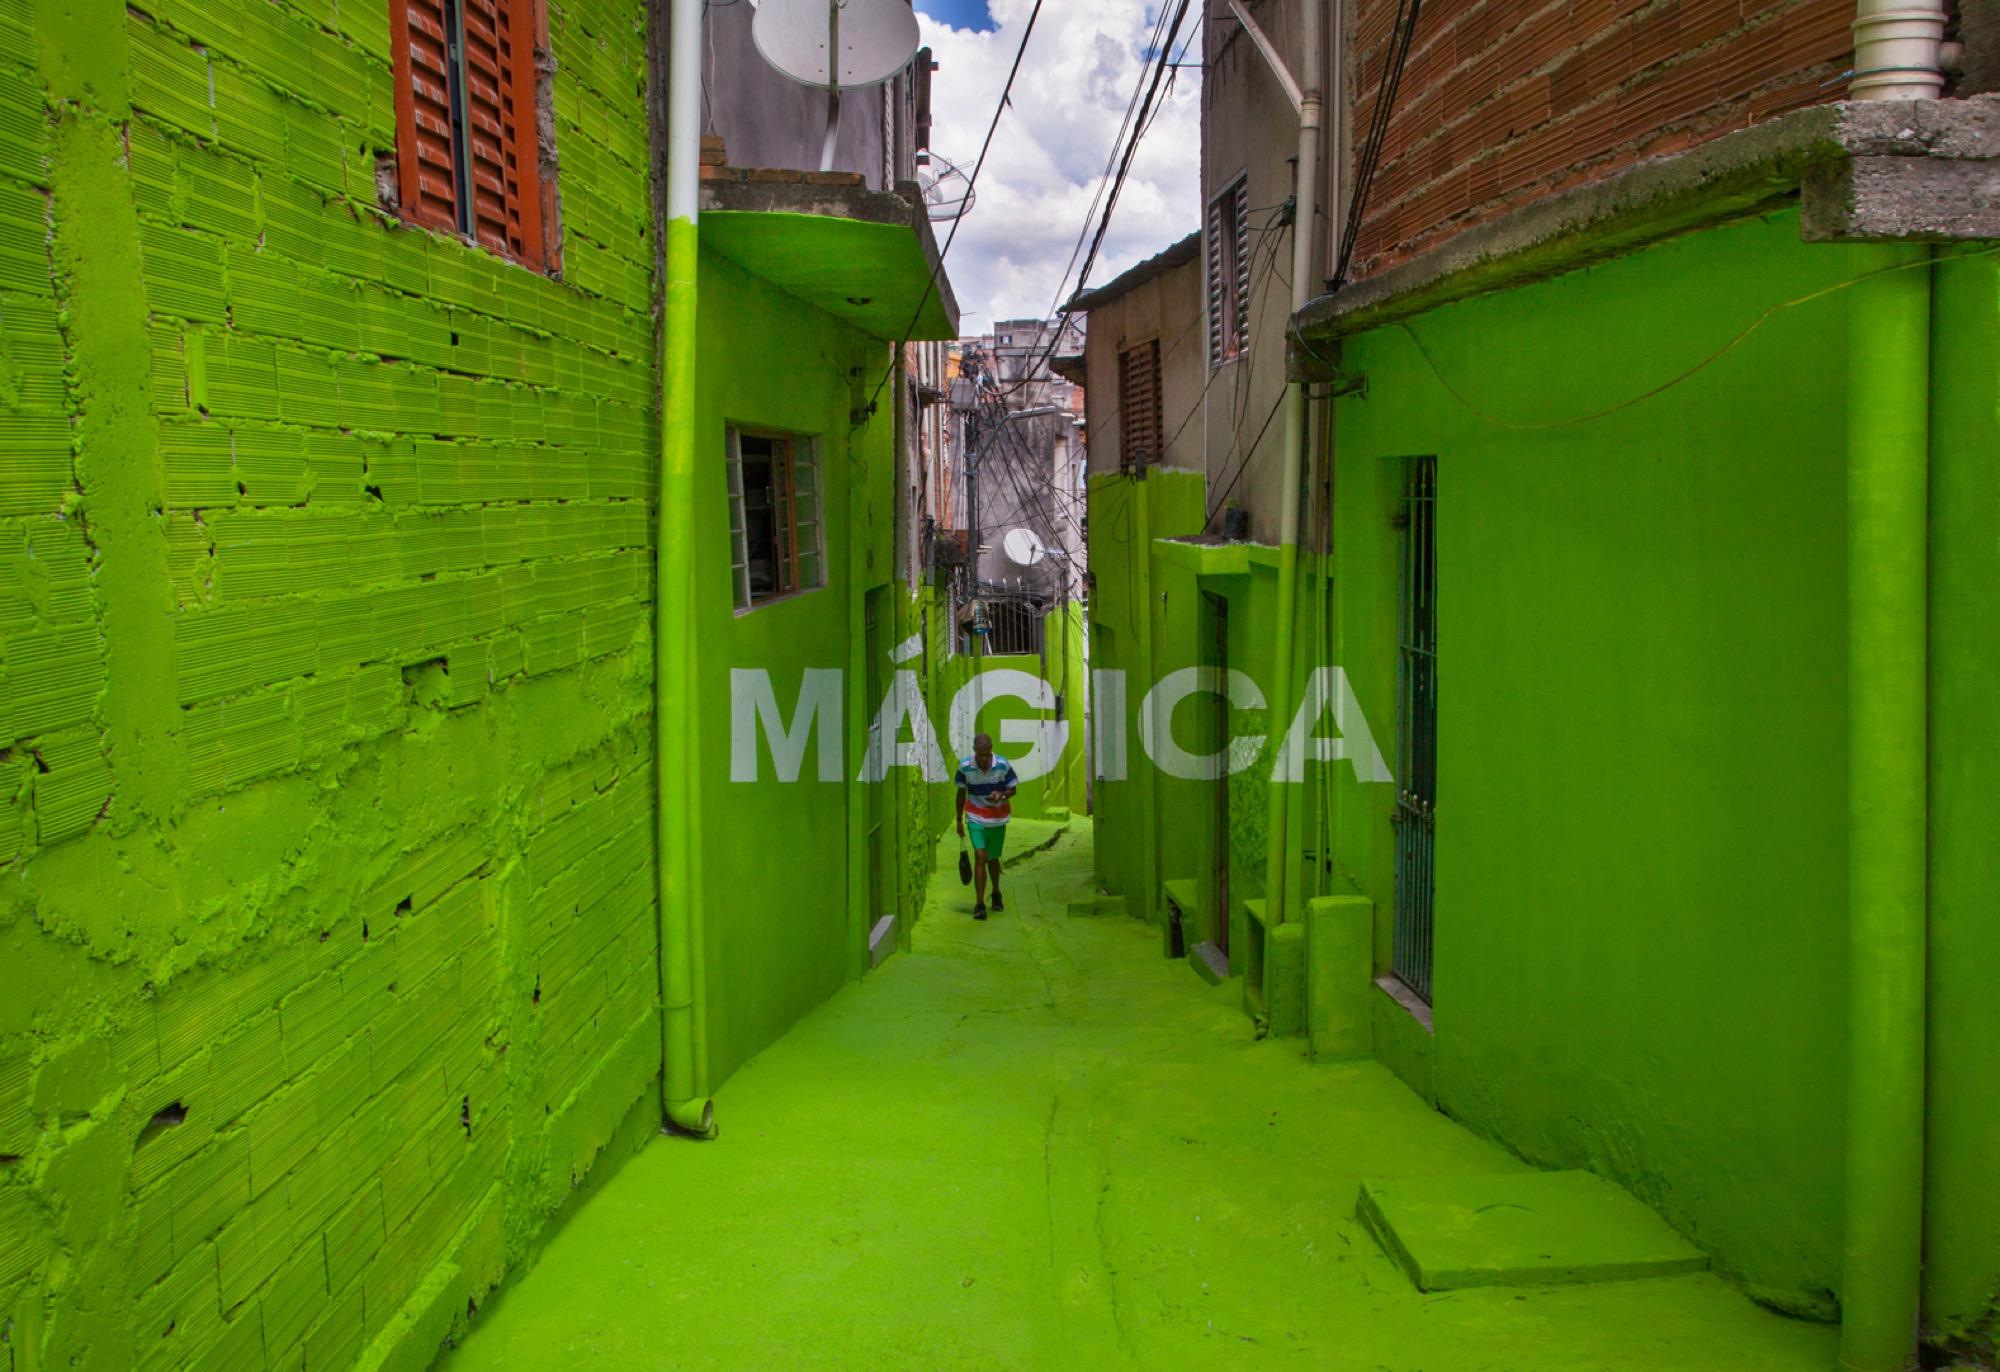 """Poesia Magica"" by Boa Mistura in São Paulo"